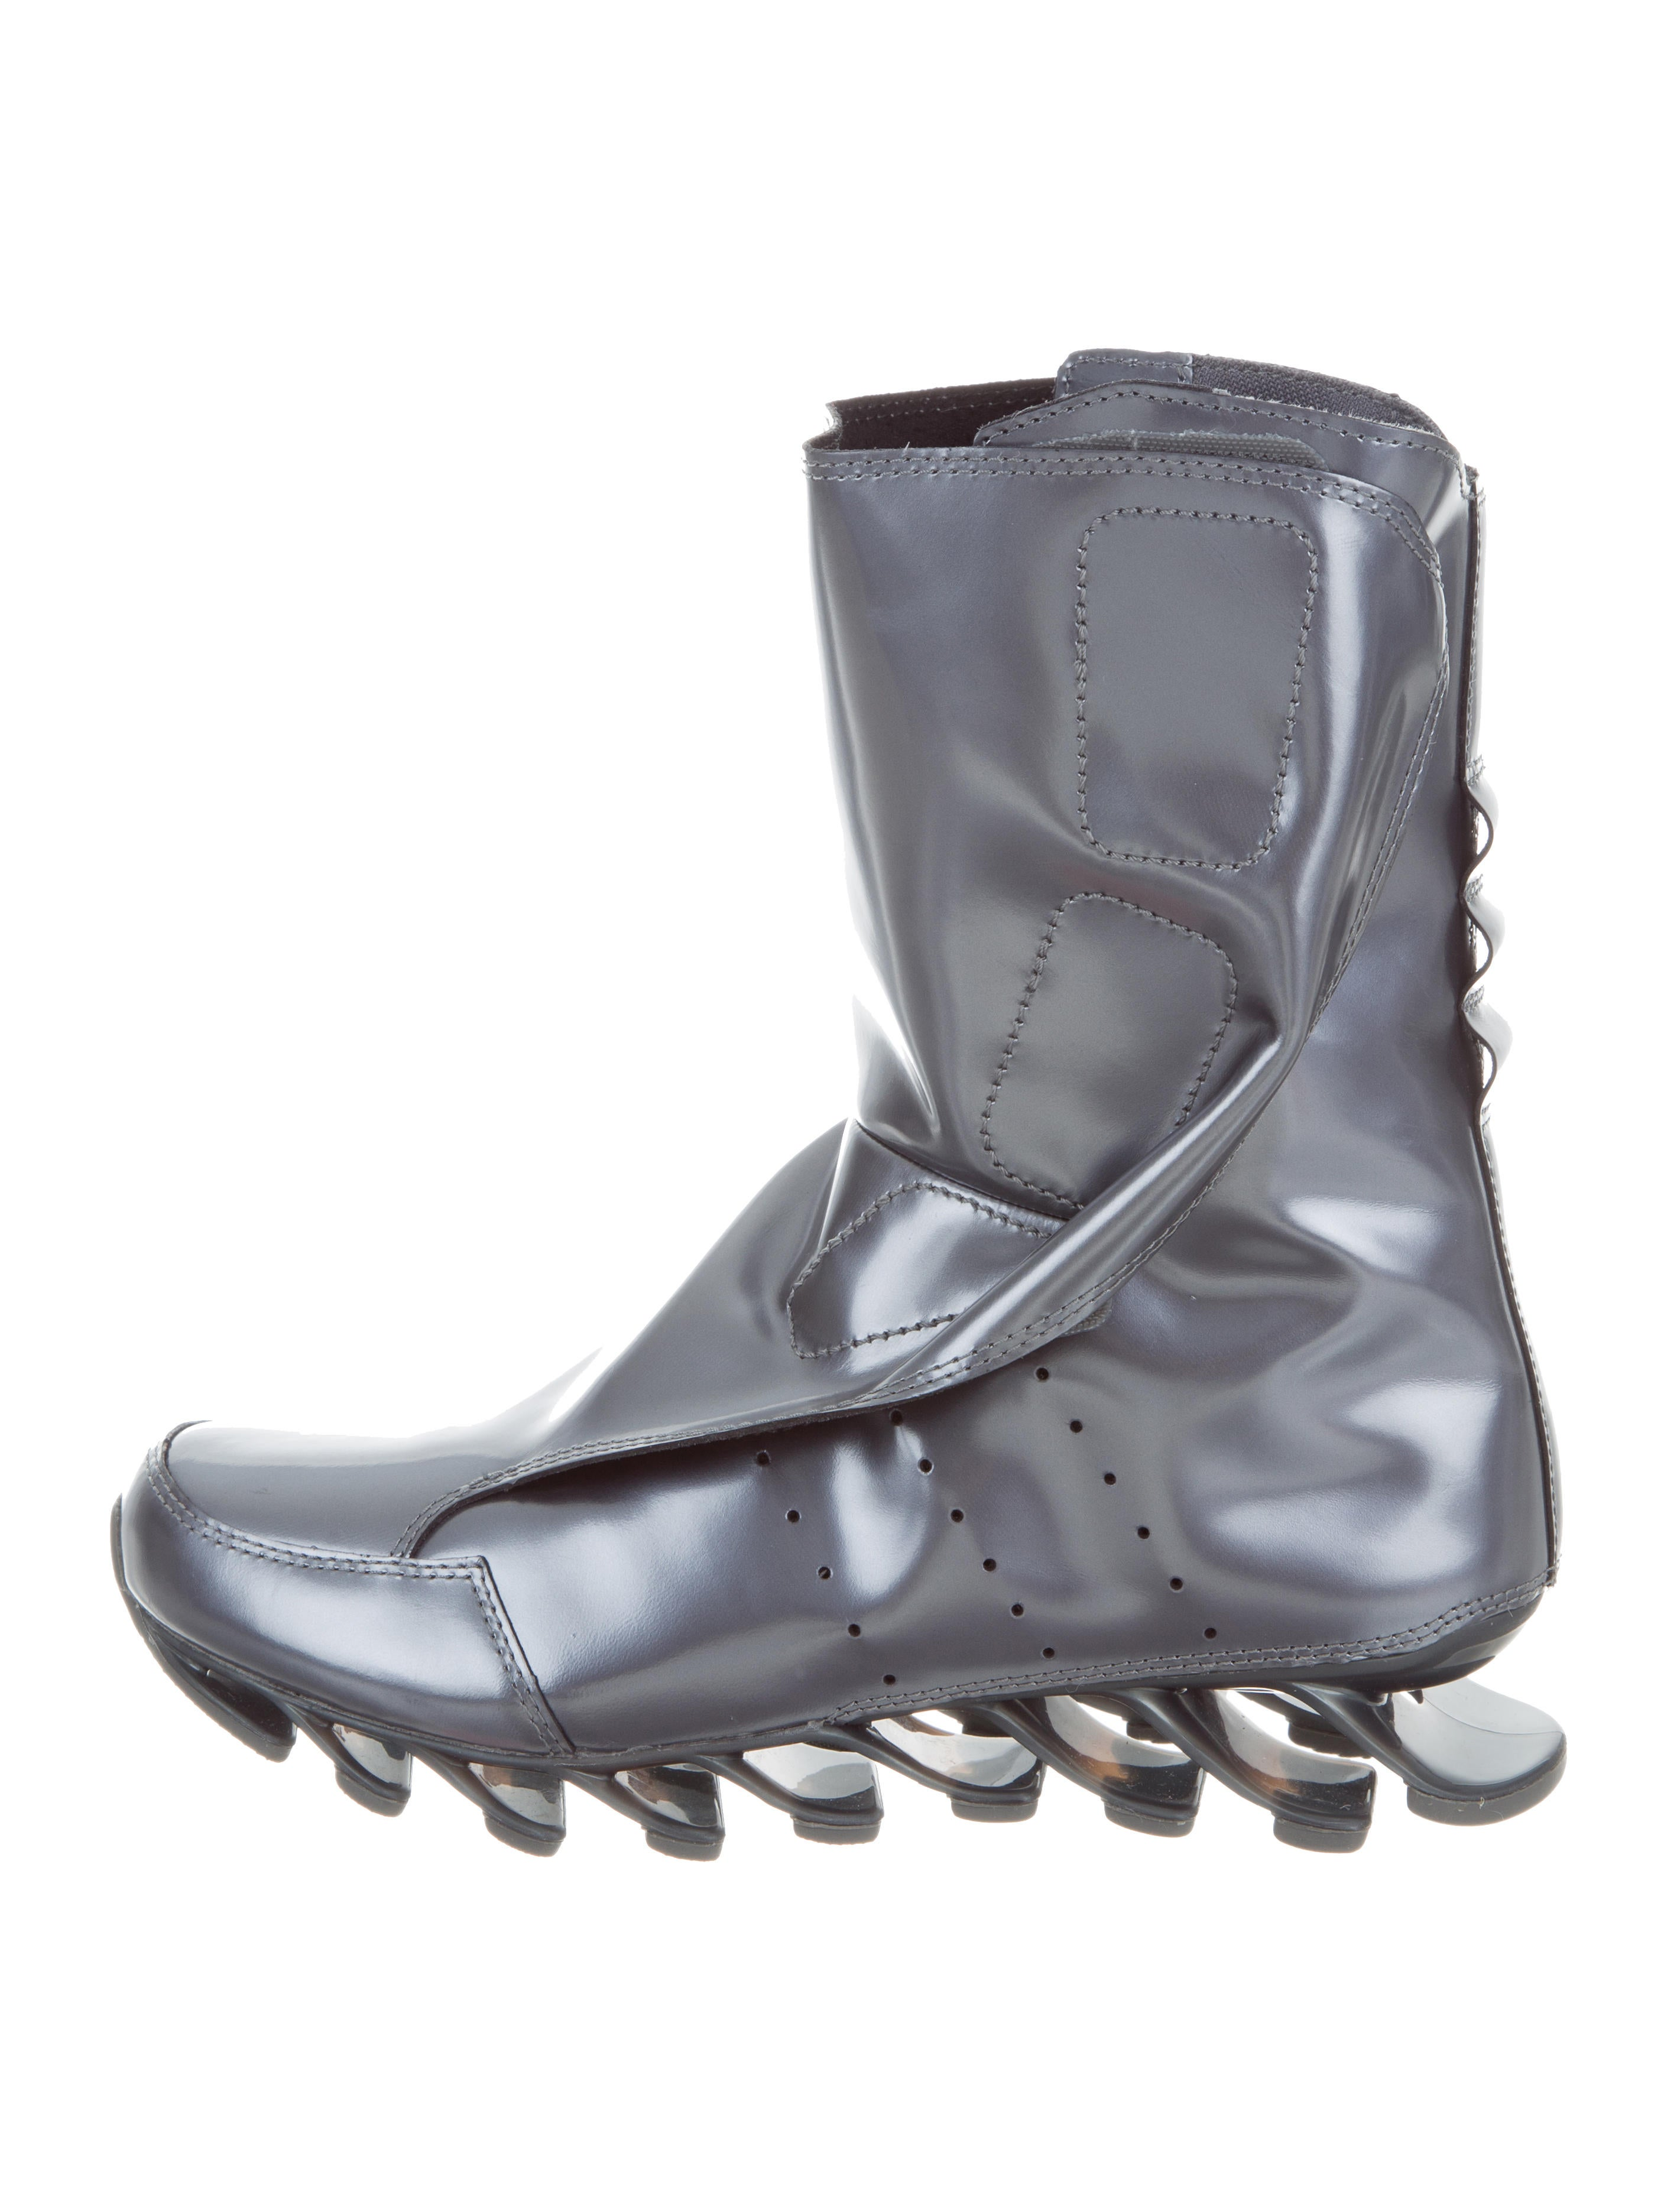 b426772fe ... get rick owens x adidas 2015 springblade ankle boots. 2015 springblade  ankle boots 8a417 8f1b2